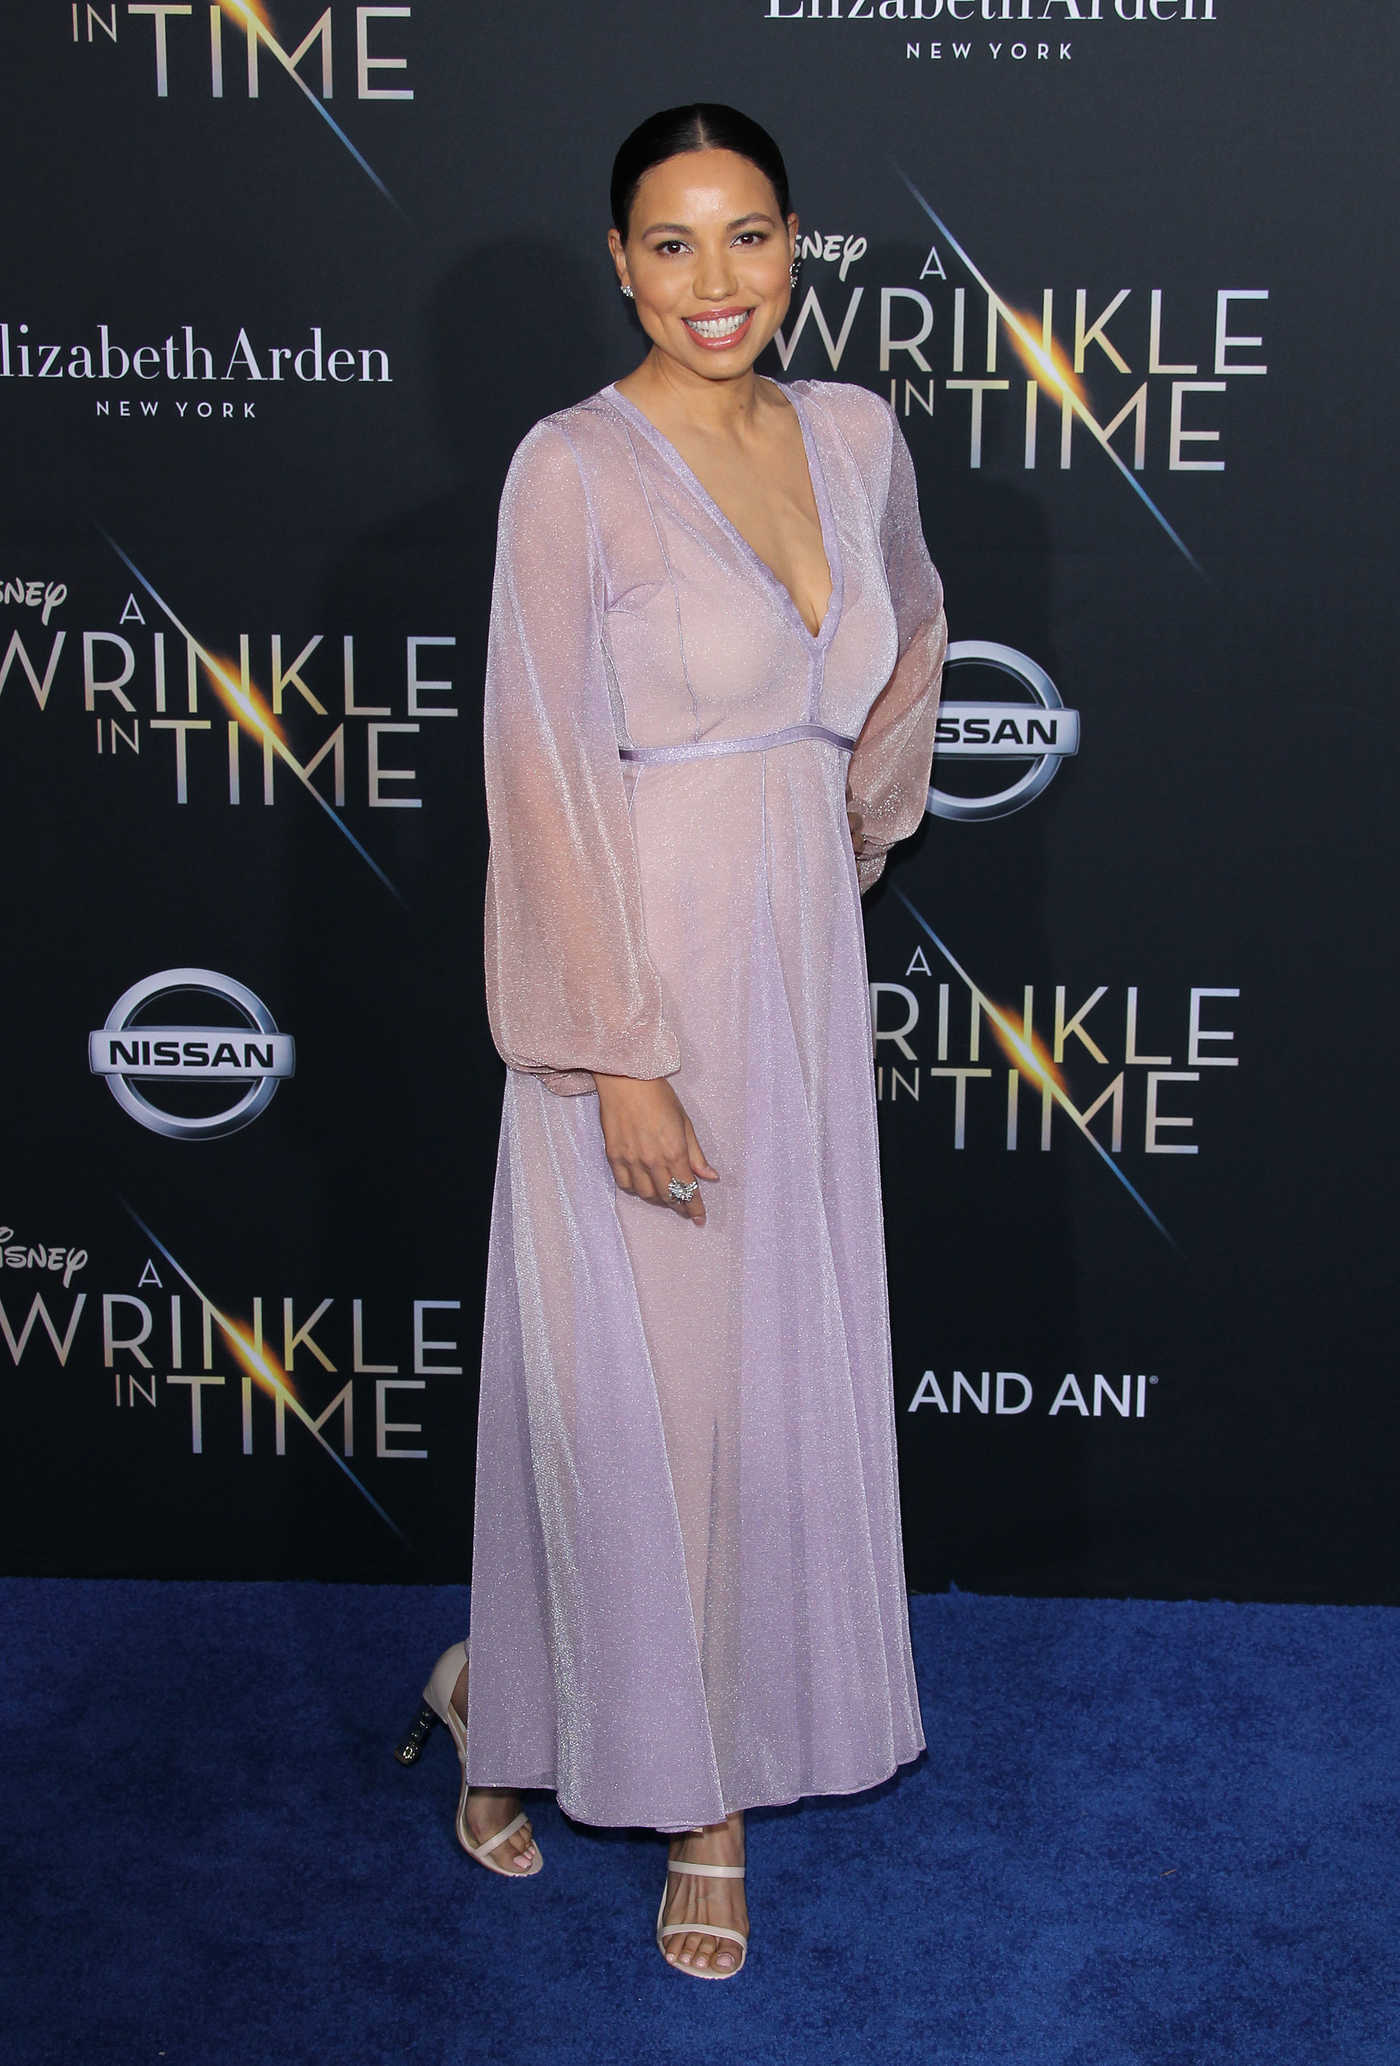 Jurnee Smollett-Bell at A Wrinkle in Time Premiere in Los Angeles 02/26/2018